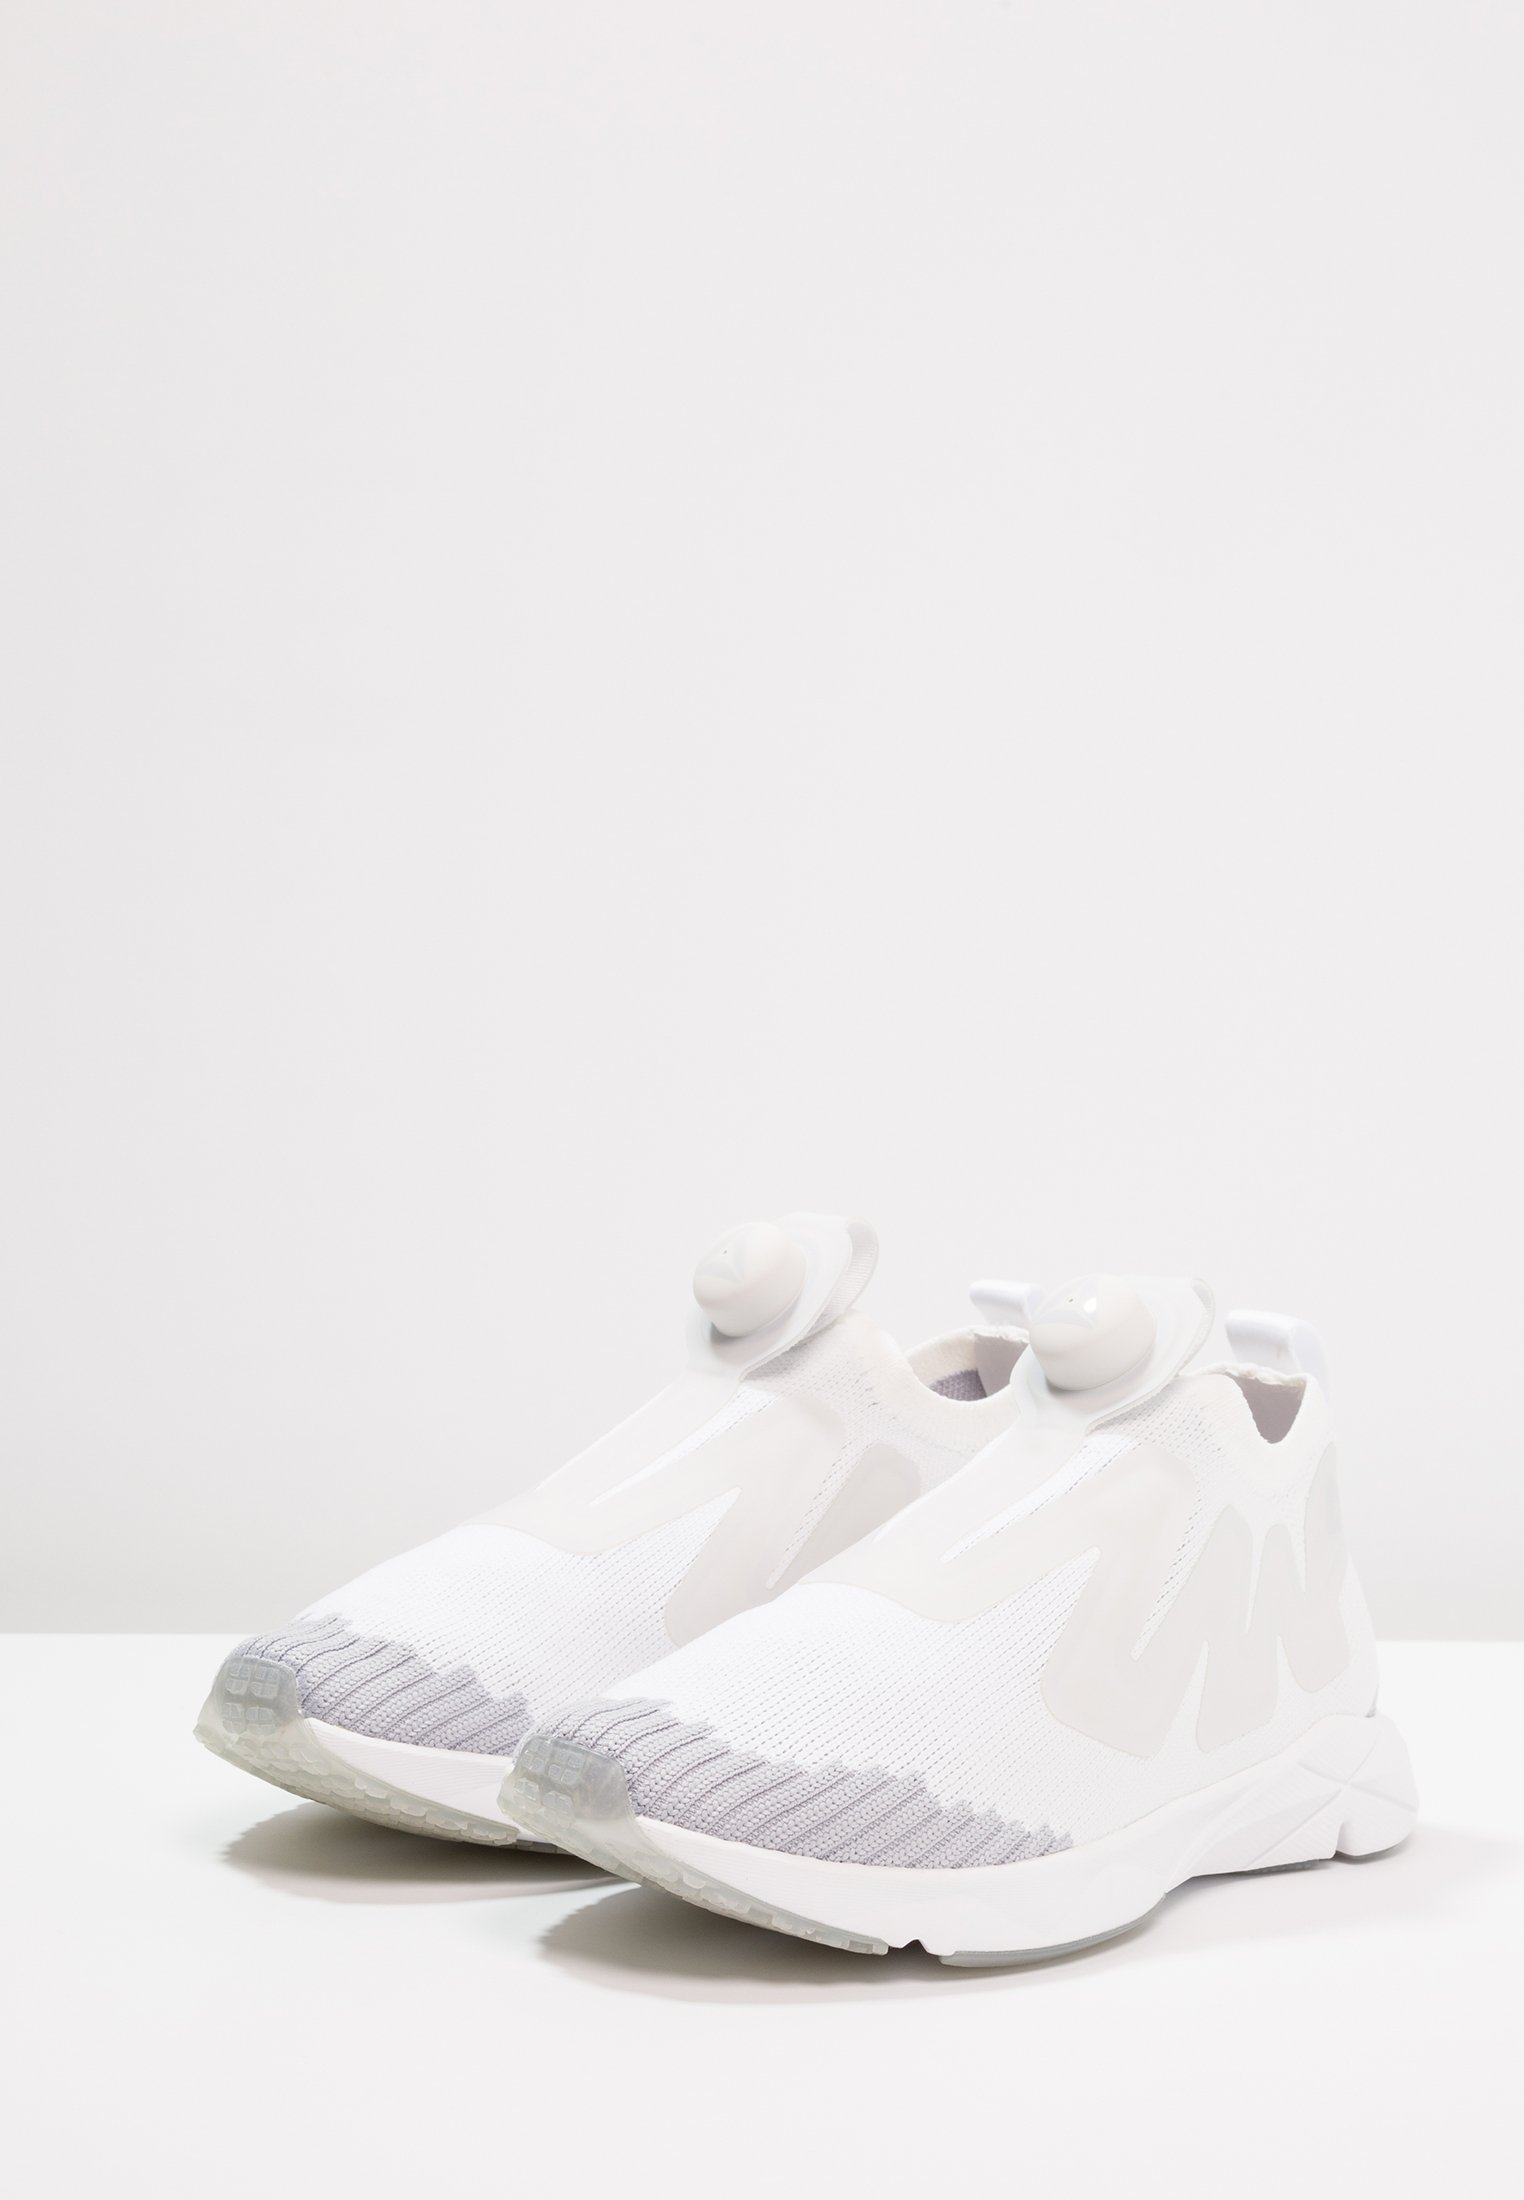 Running White De Neutres Grey UltkChaussures Reebok Pump cloud Supreme KF1lTcJ